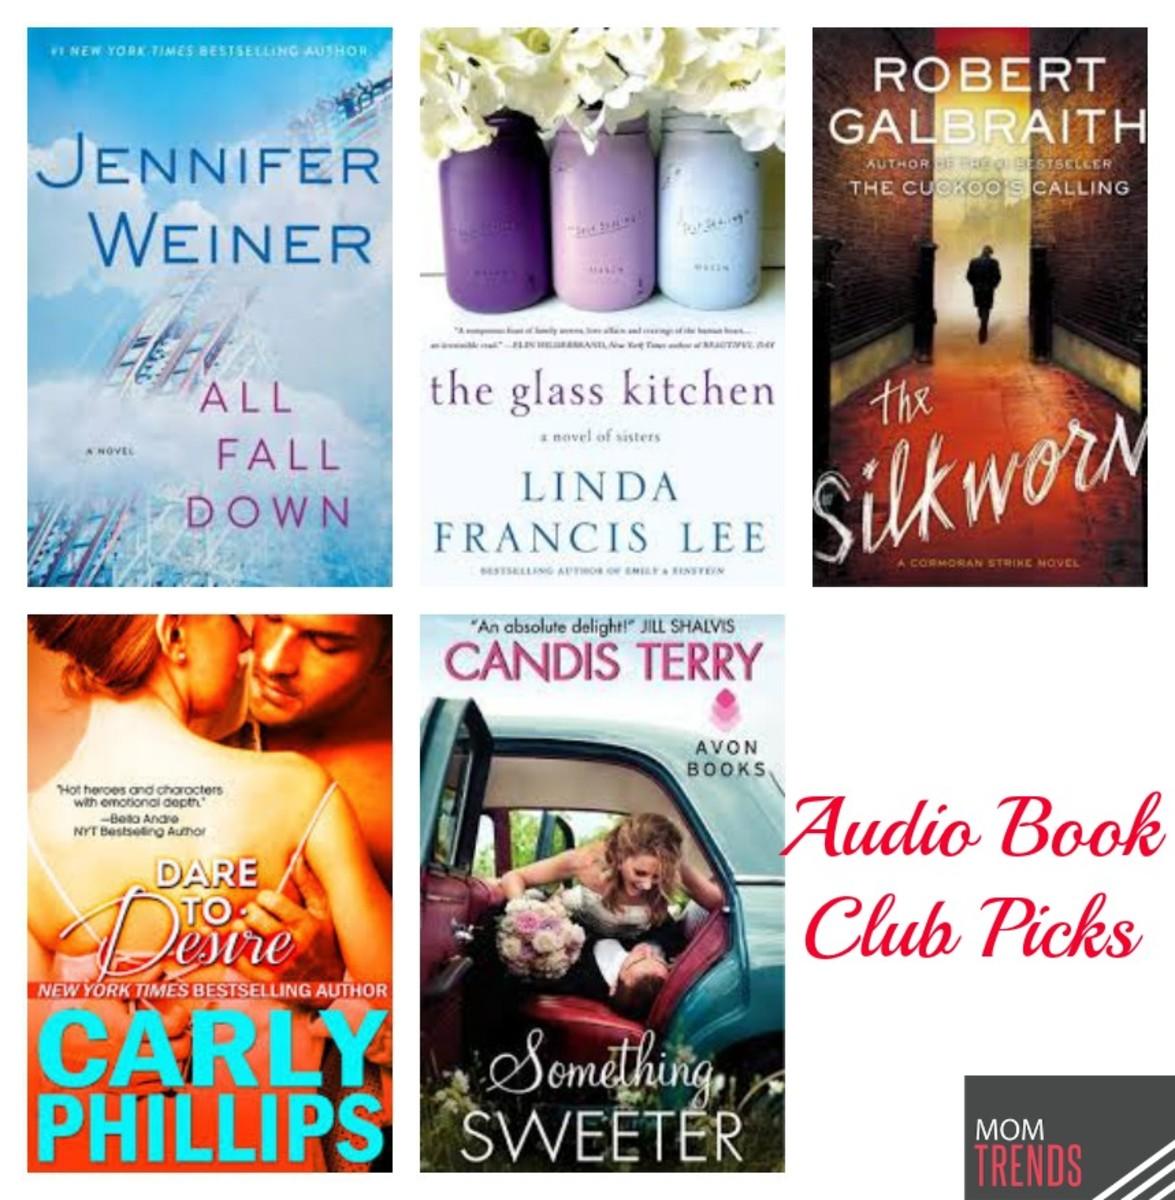 Audio Book Club Picks